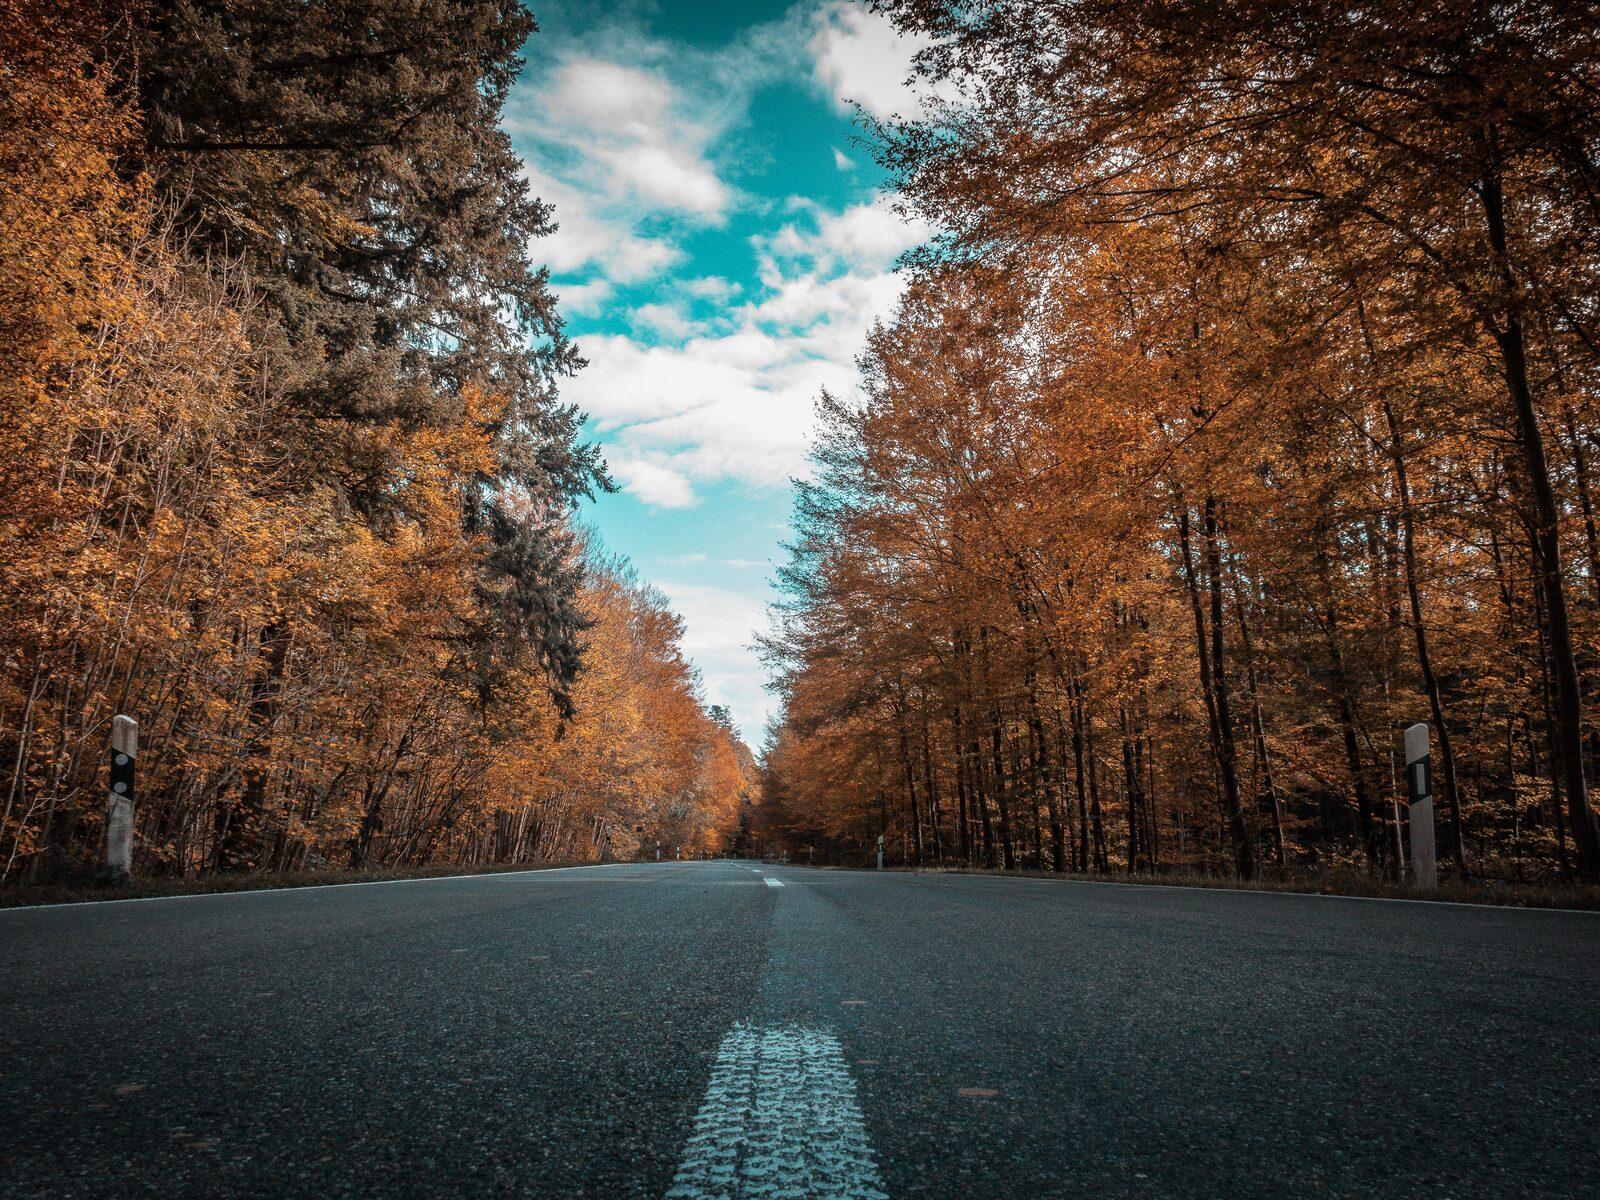 alone-road-forest-autumn-golden-trees-ultra-4k-n1.jpg